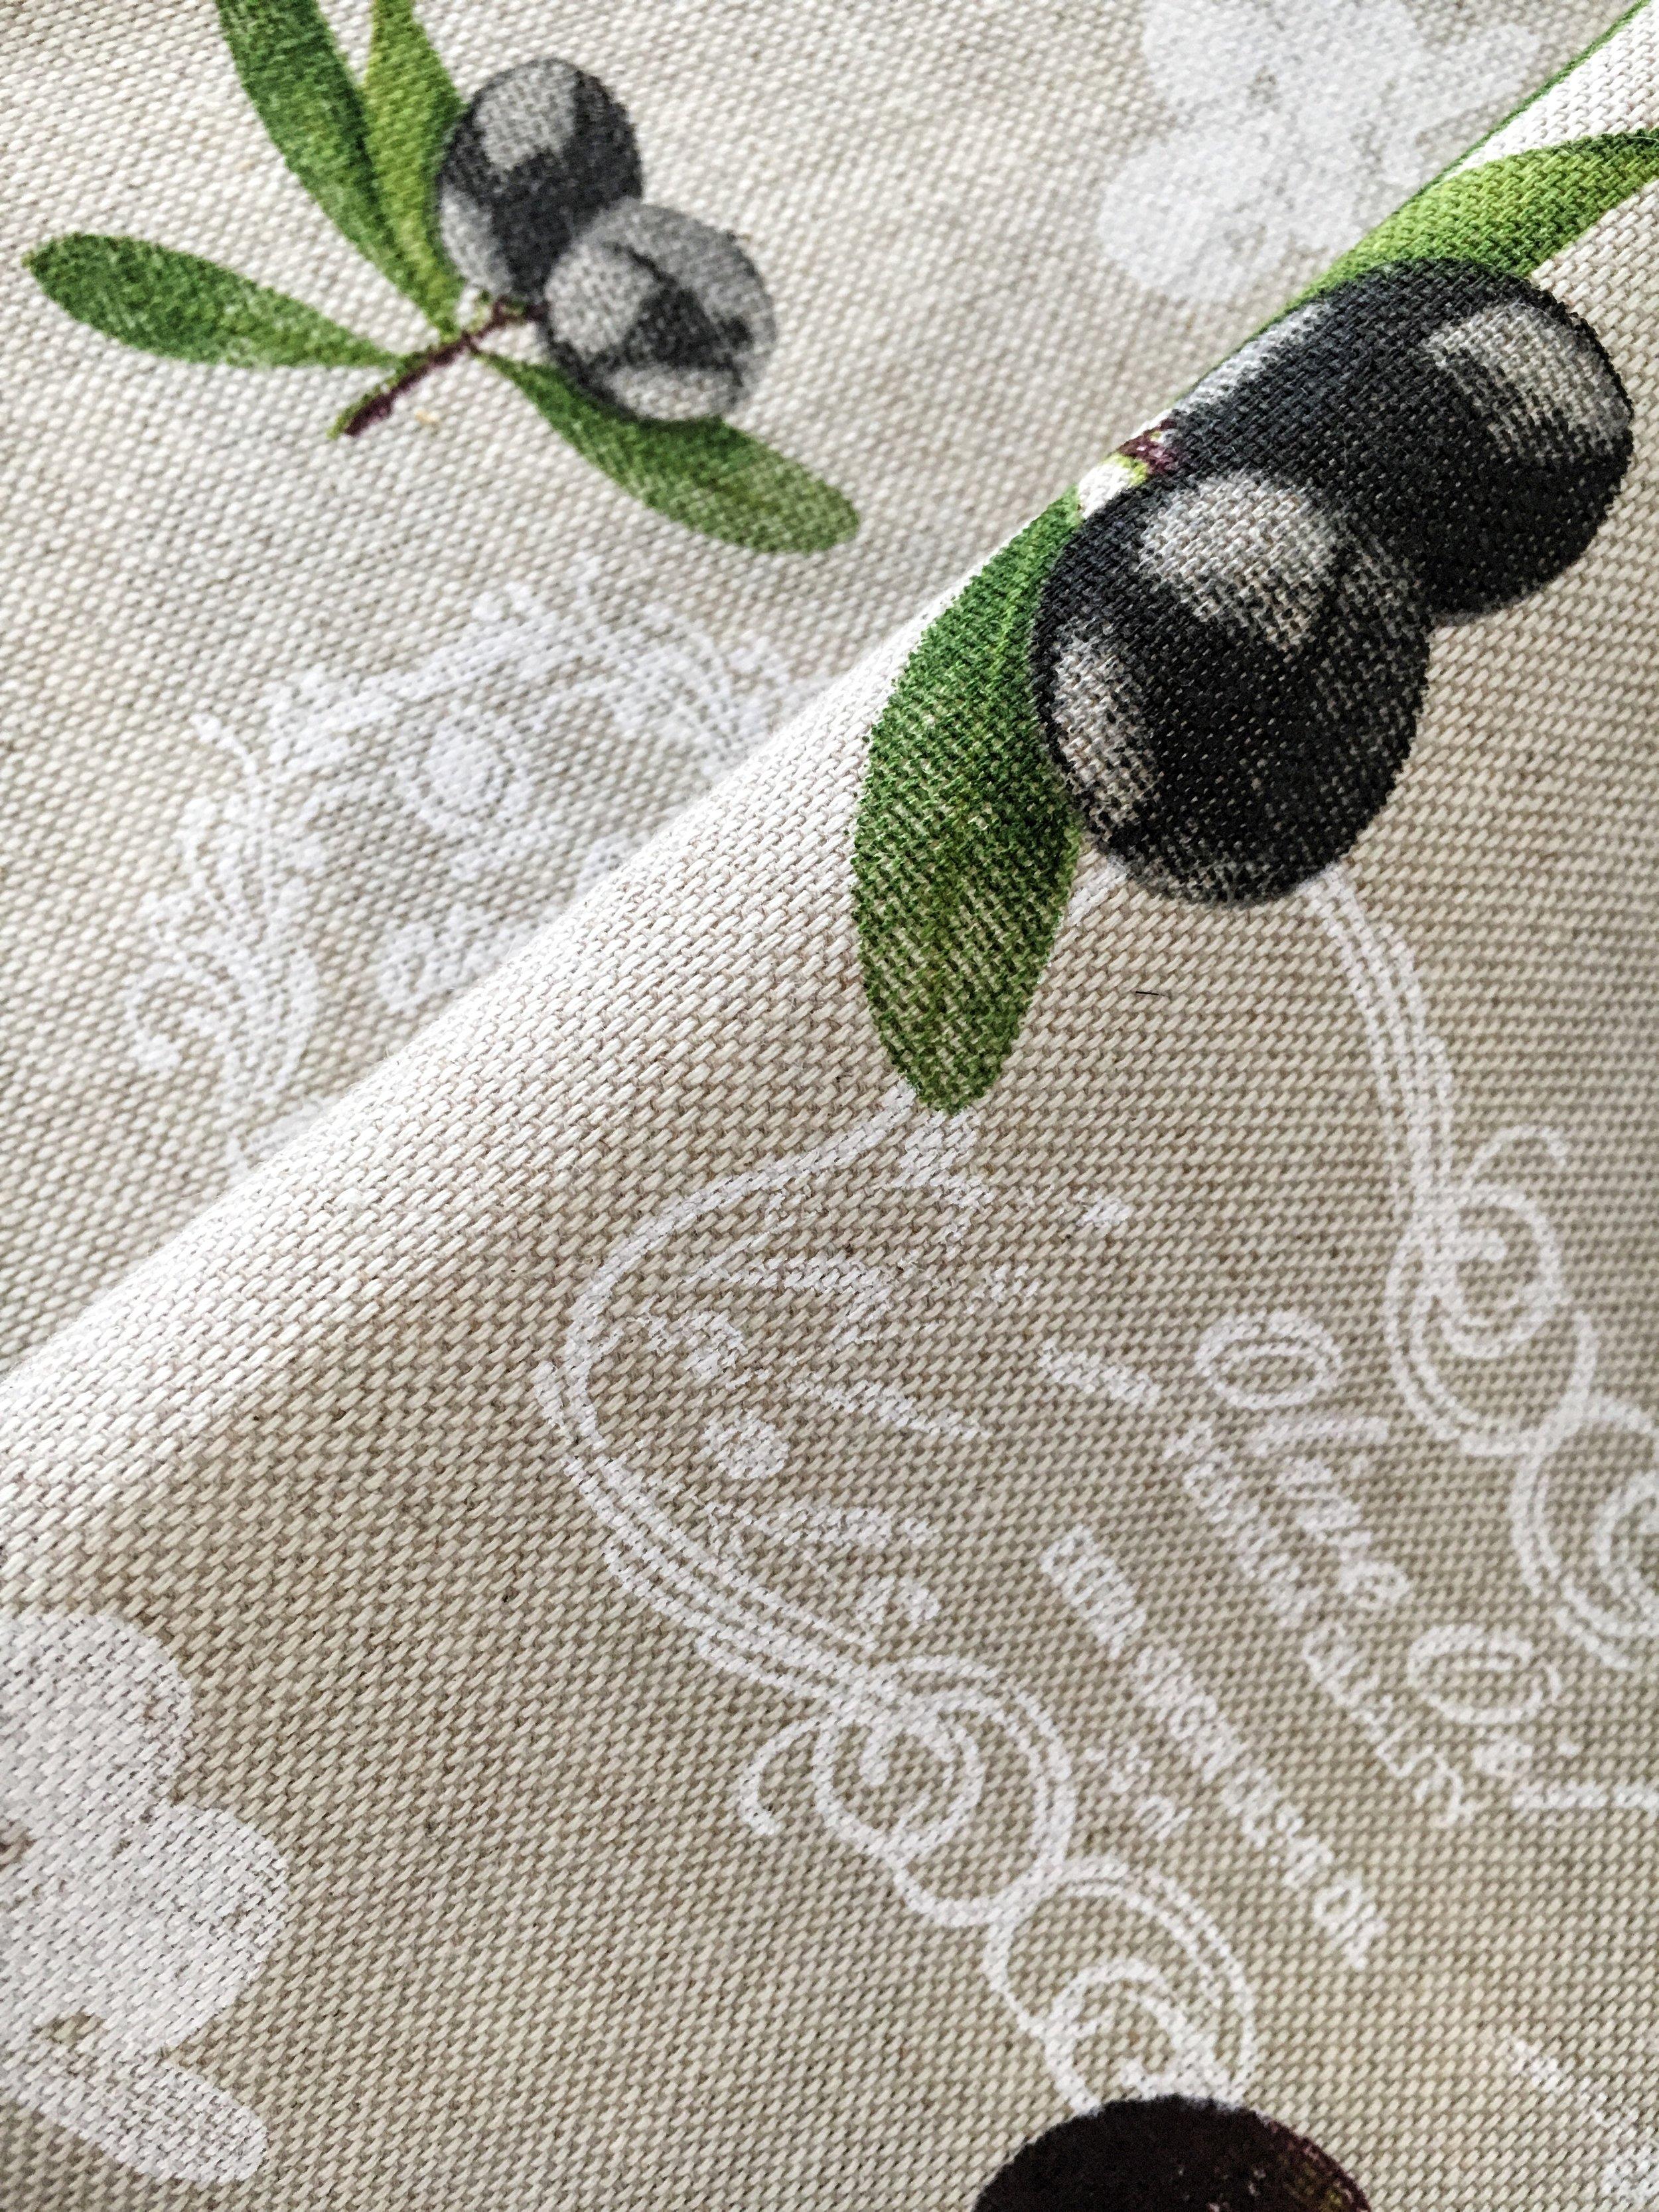 CottonFabricOlivesBB1.jpg